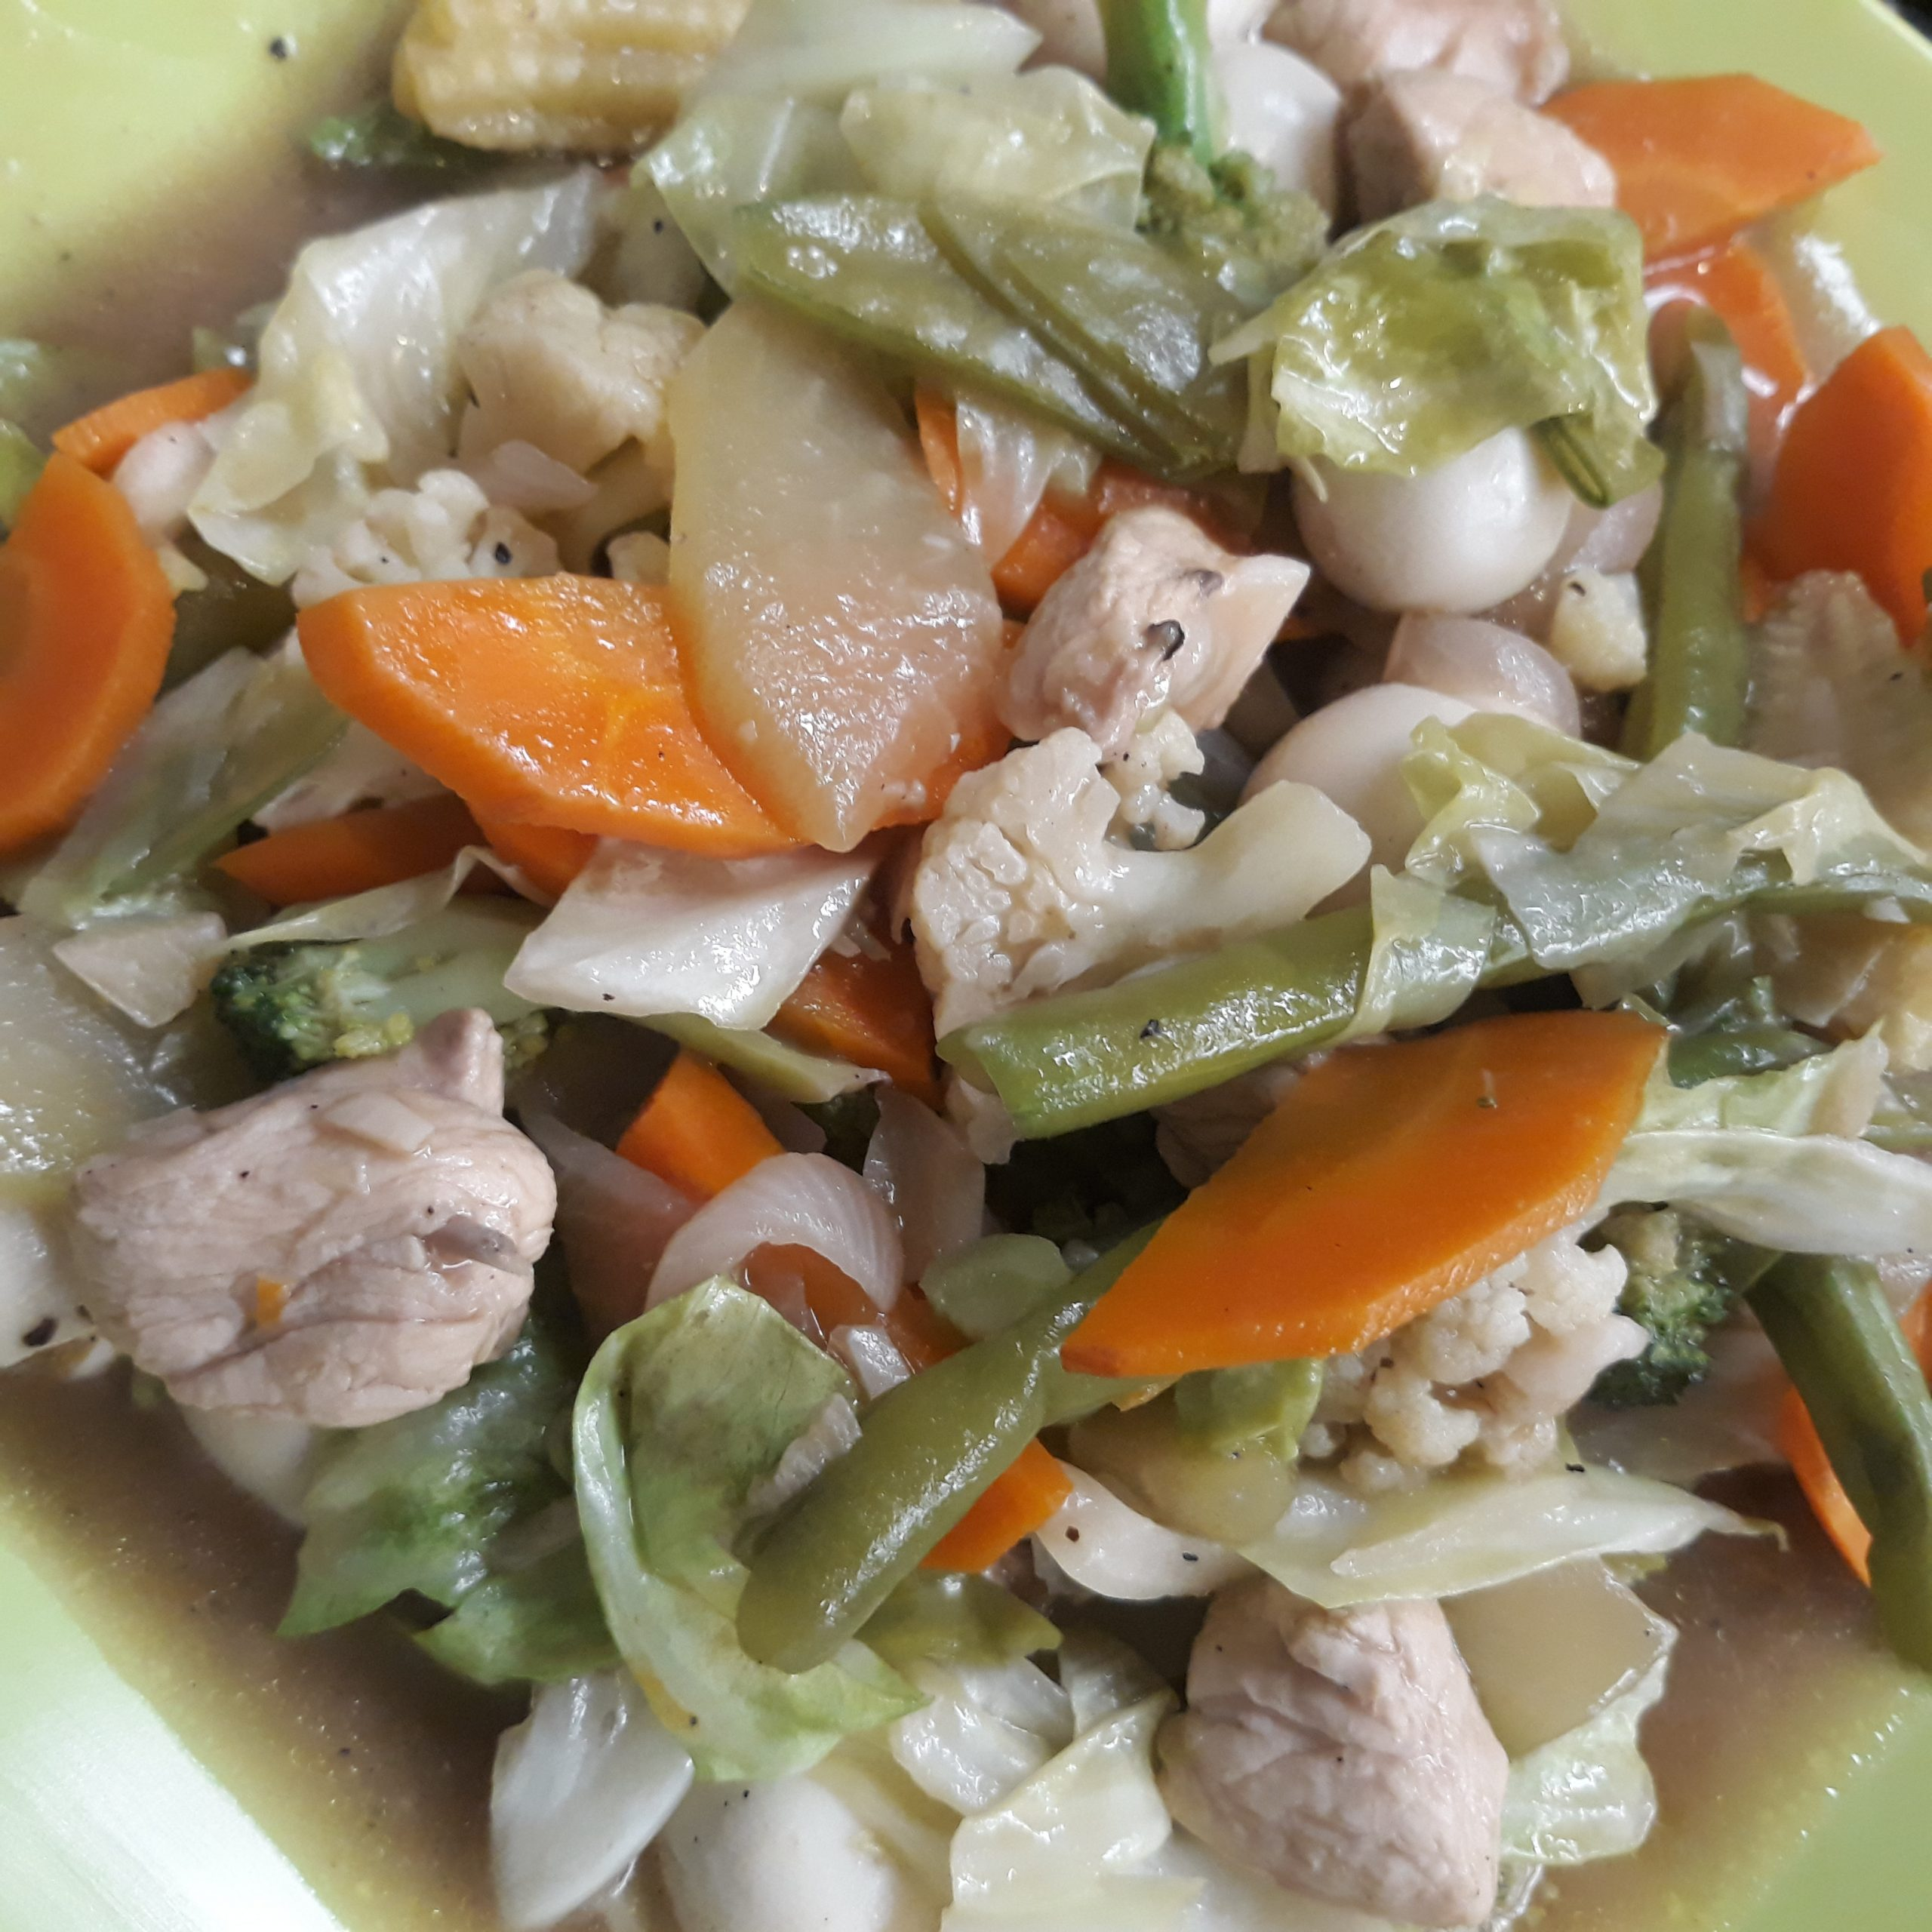 Chopsuey Dish showing bits of carrots, string beans, cauliflower.